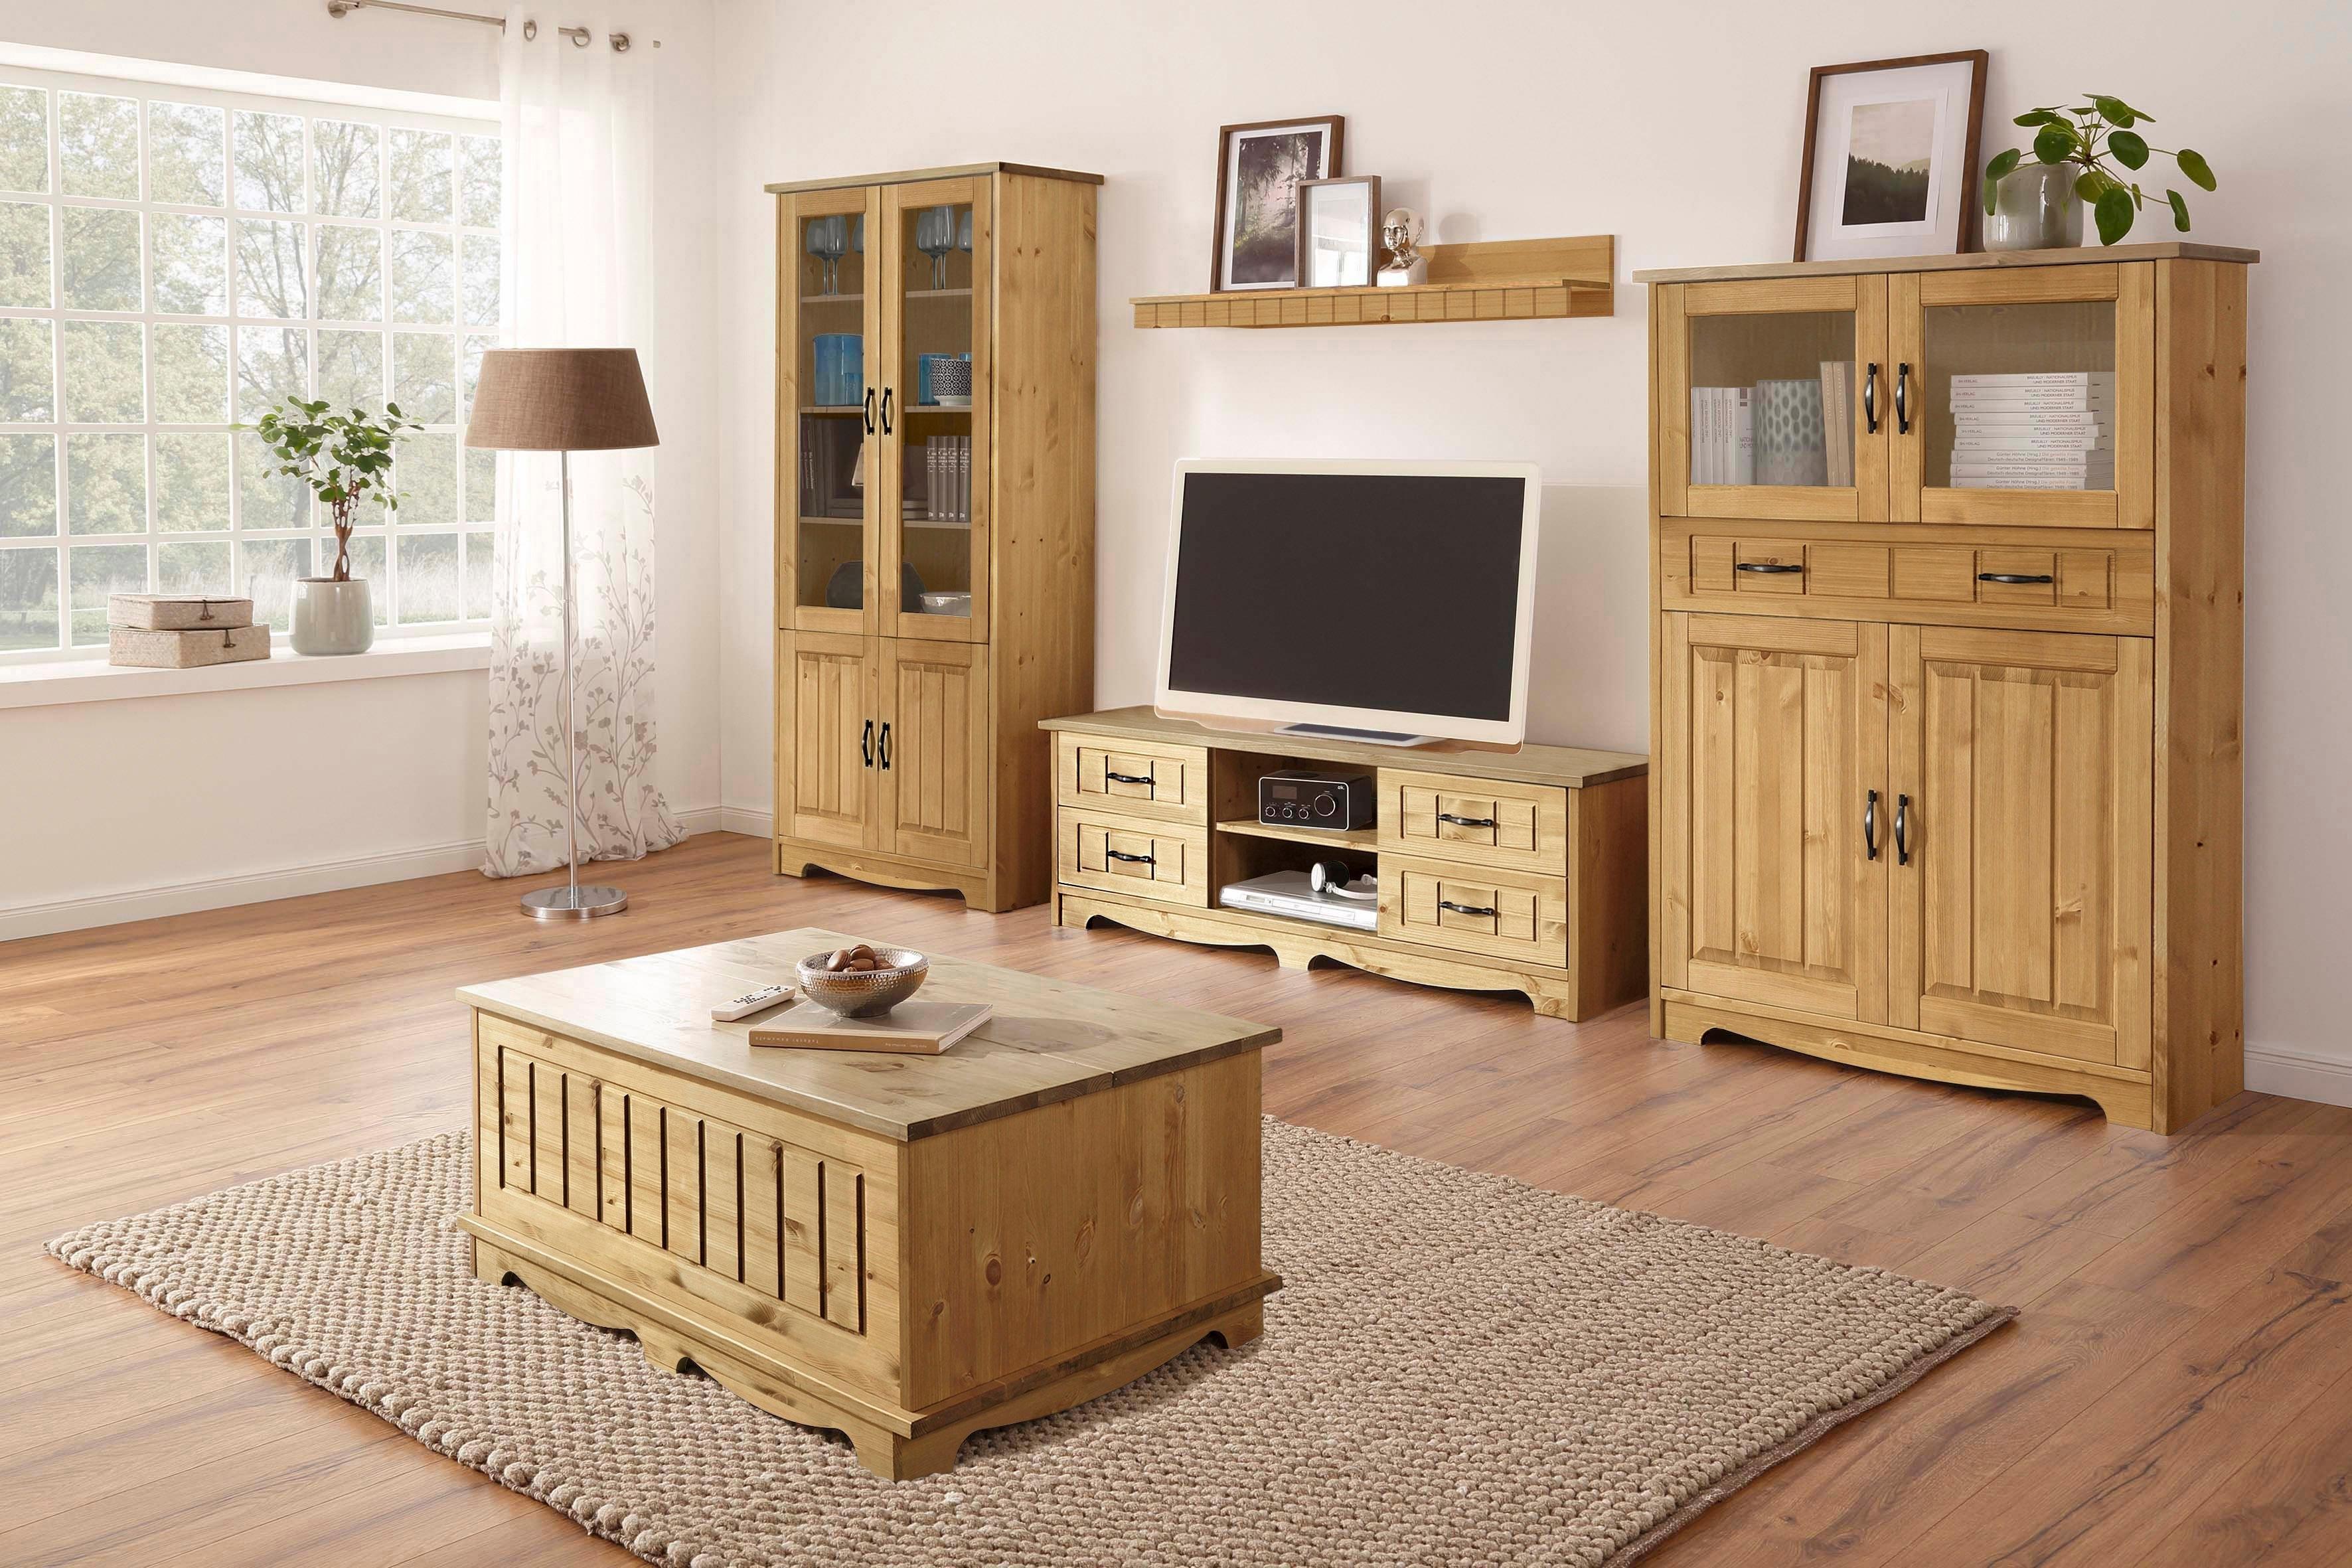 Home affaire wandmeubel Trinidad Set van 1 vitrinekast, 1 tv-meubel, 1 highboard, 1 wandboard (set, 4 stuks) - gratis ruilen op otto.nl